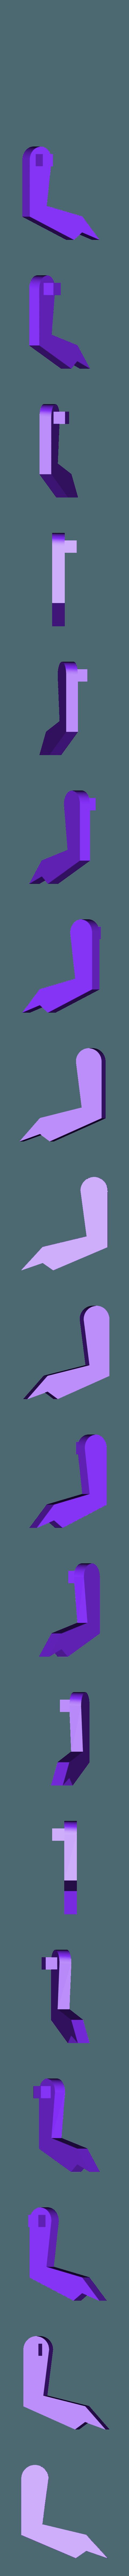 Arm_Left.stl Download free STL file T-Rex Windup Walker • 3D printer model, gzumwalt